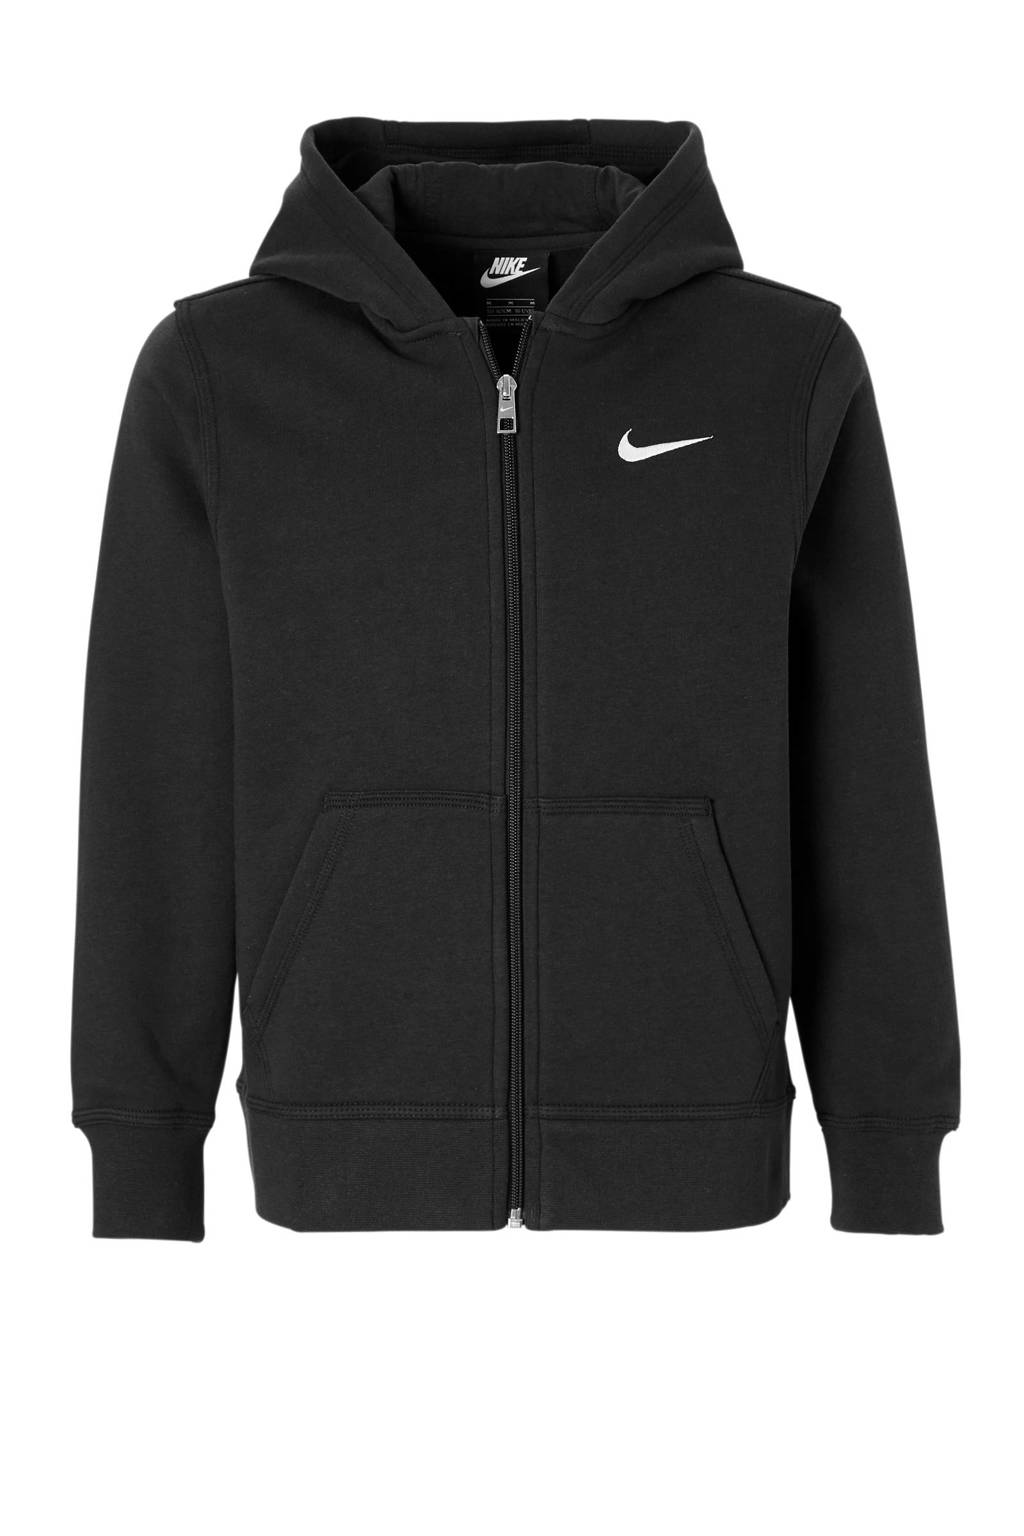 Nike   sweatvest zwart, Zwart